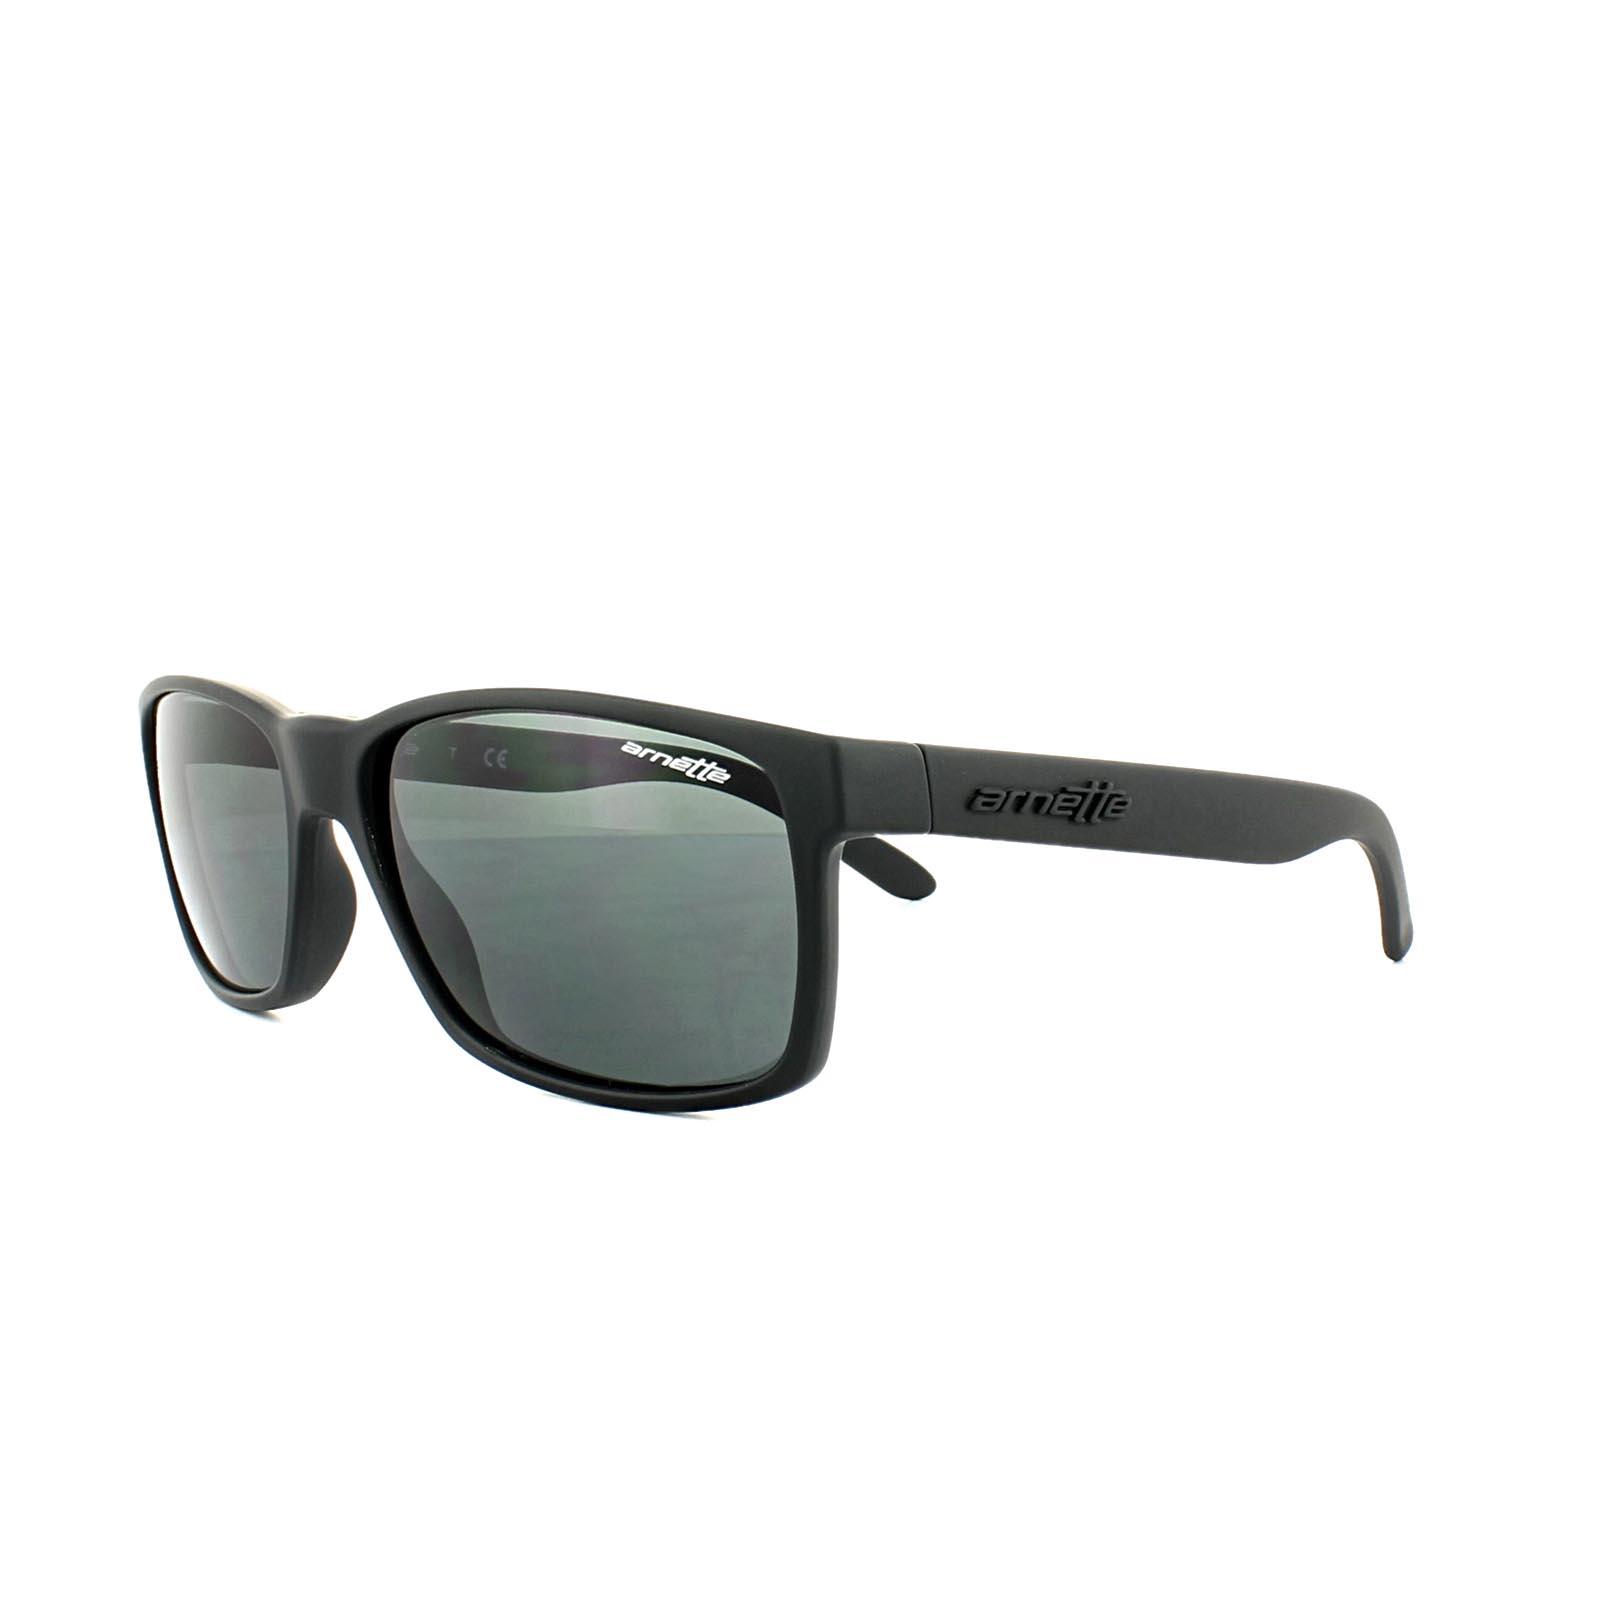 35eeec6af41 Cheap Arnette Slickster 4185 Sunglasses - Discounted Sunglasses